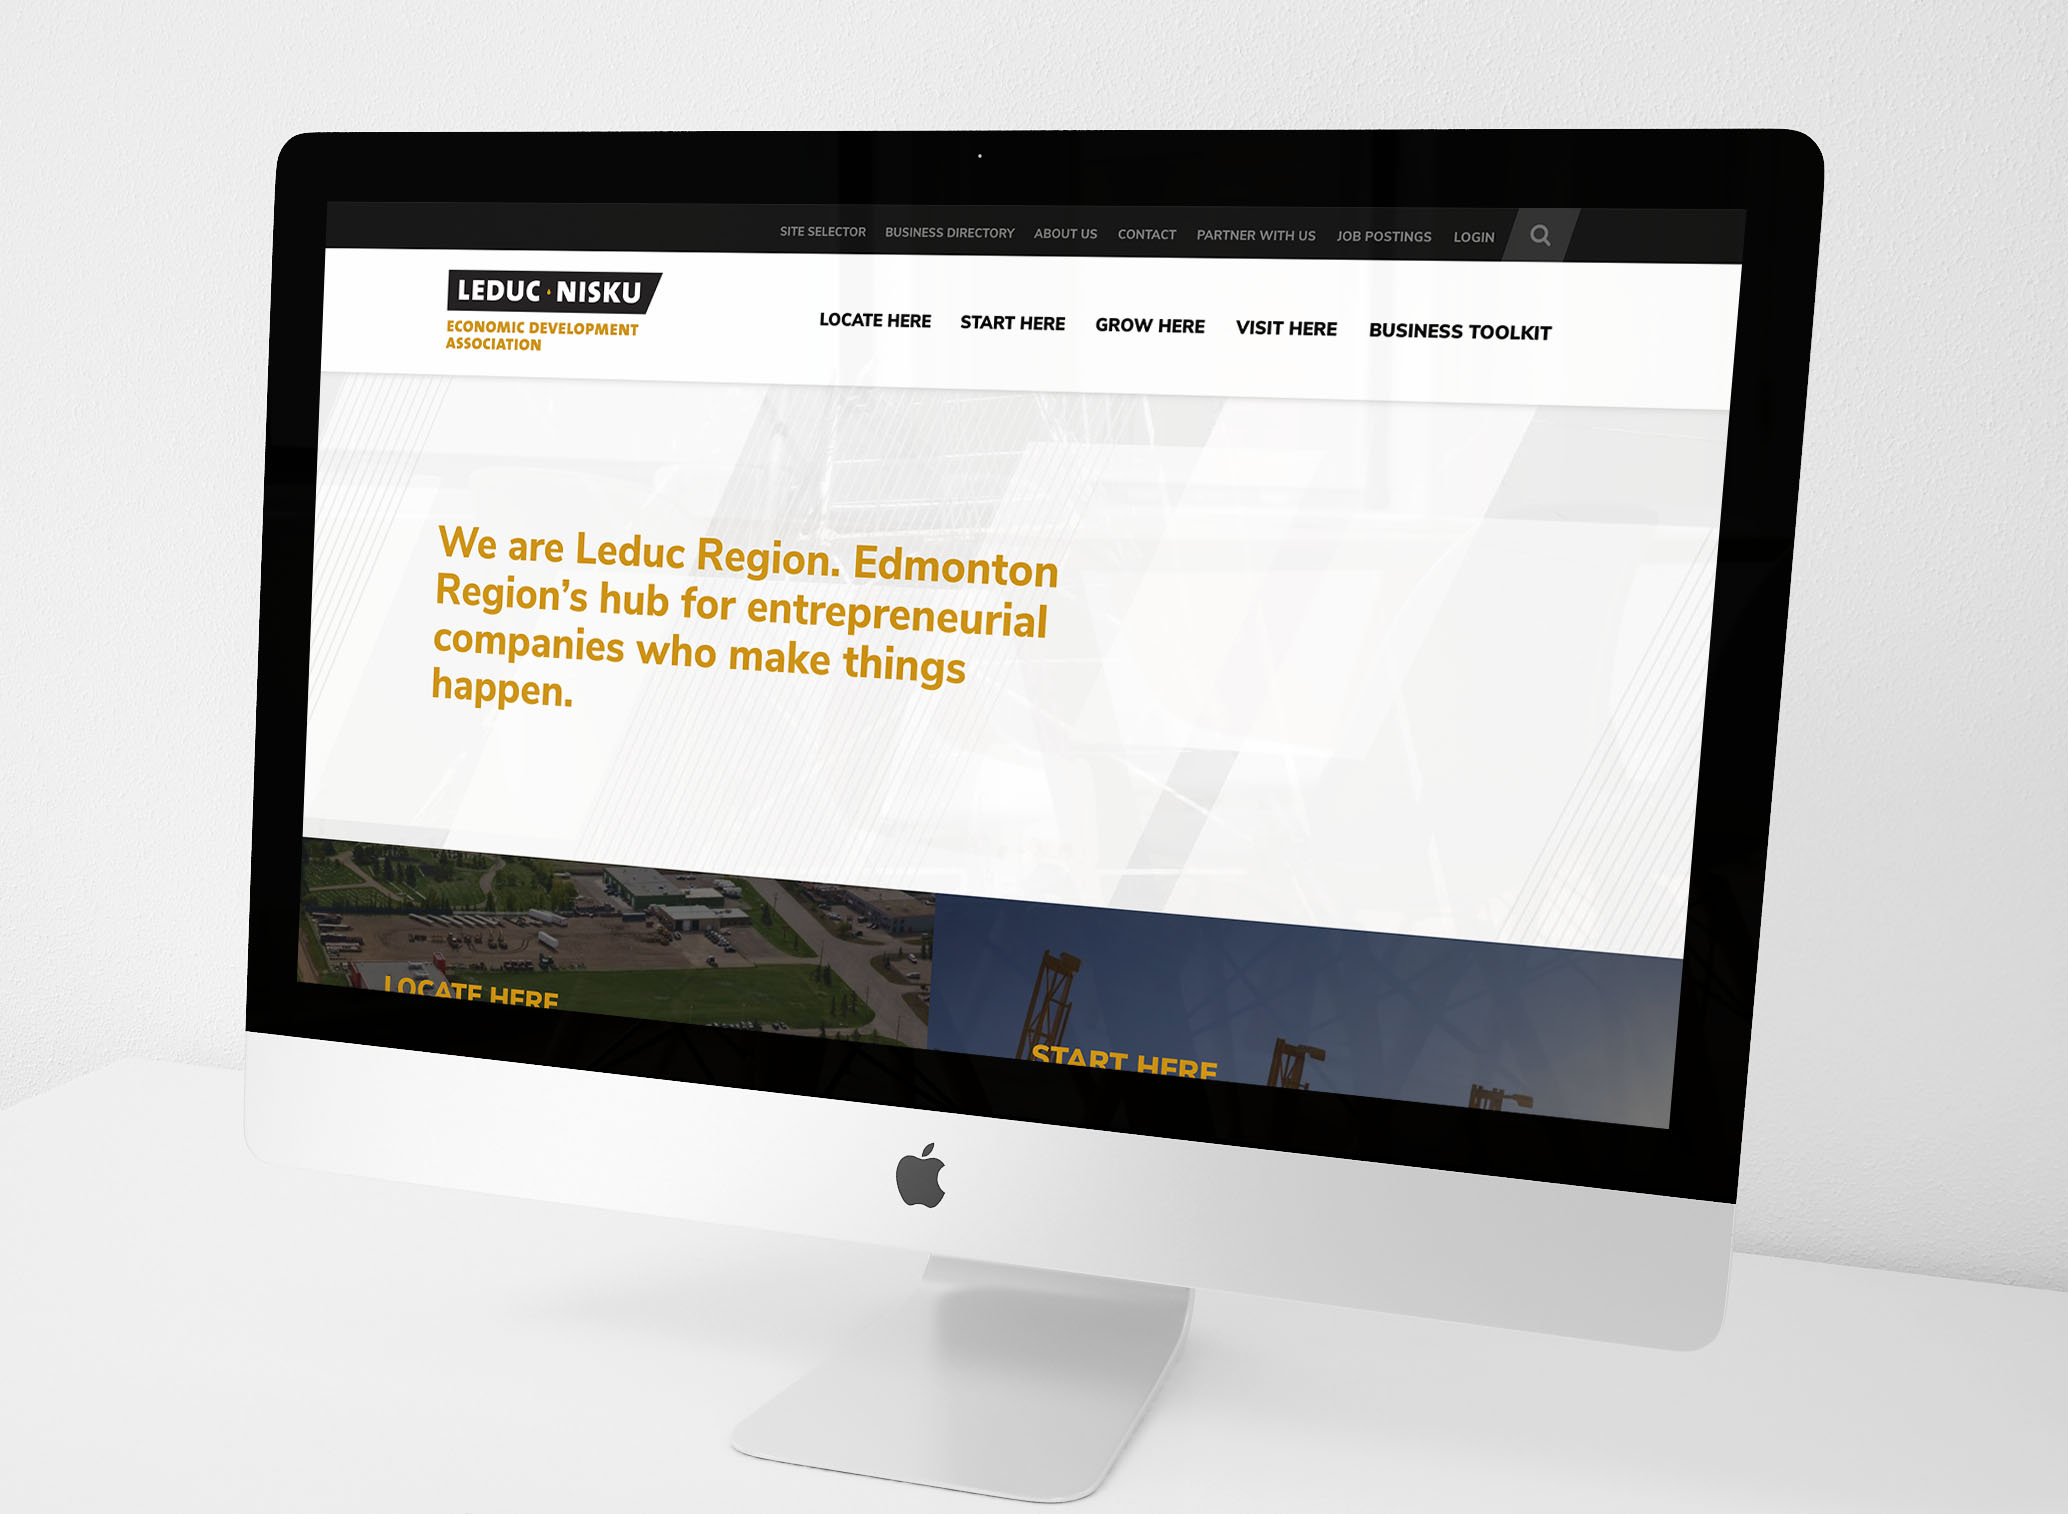 Leduc-Nisku Economic Development Association Website Design and Development